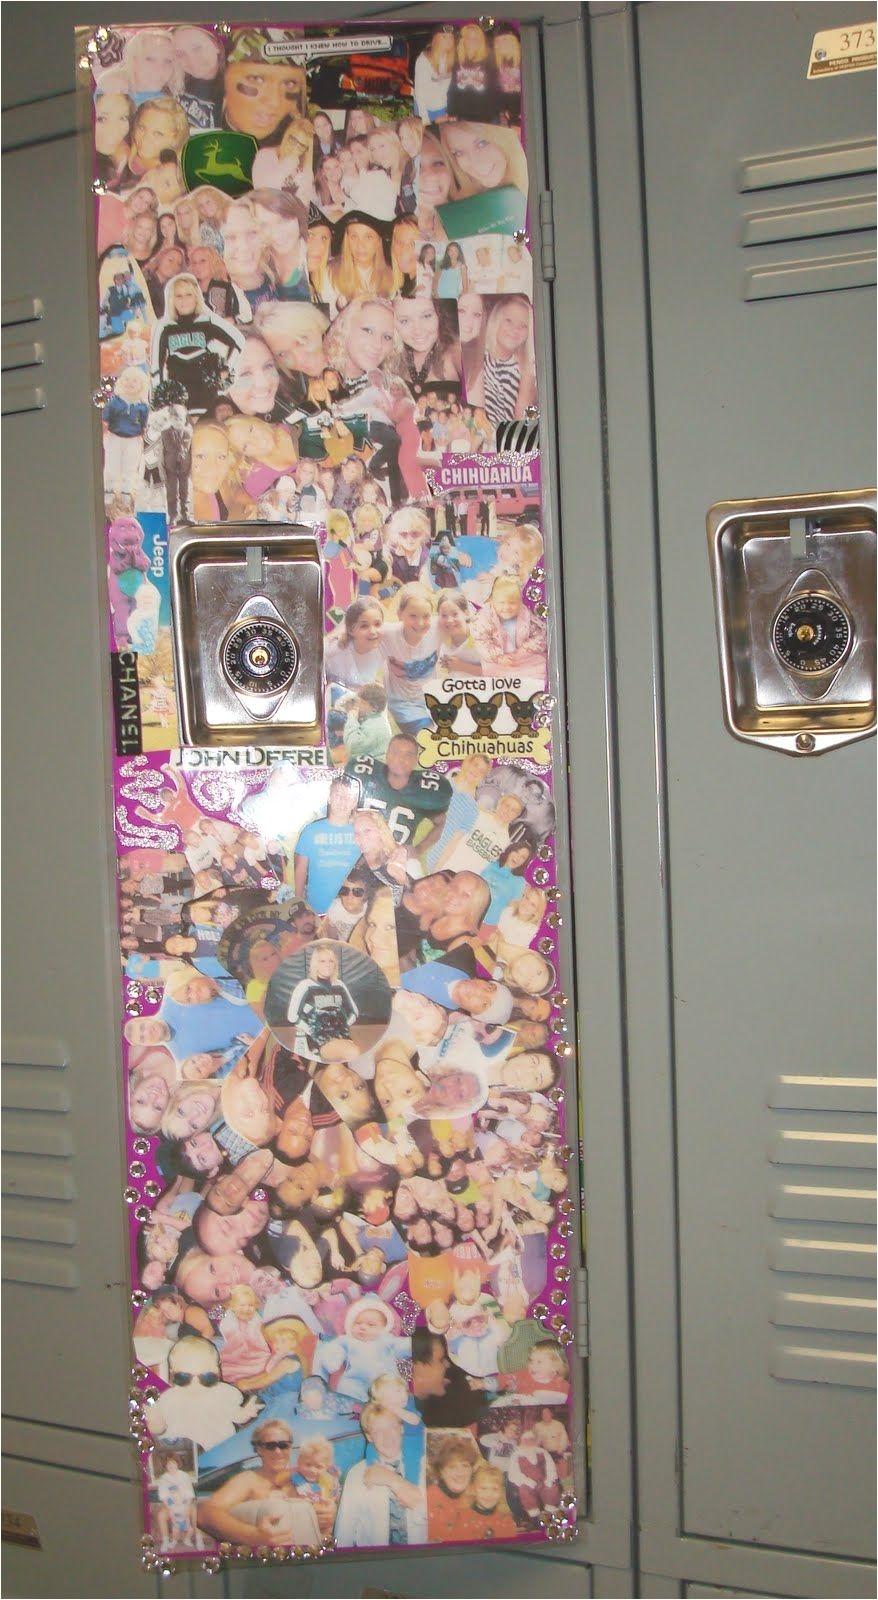 locker laureate the locker decorating expert for rock your locker teen activity